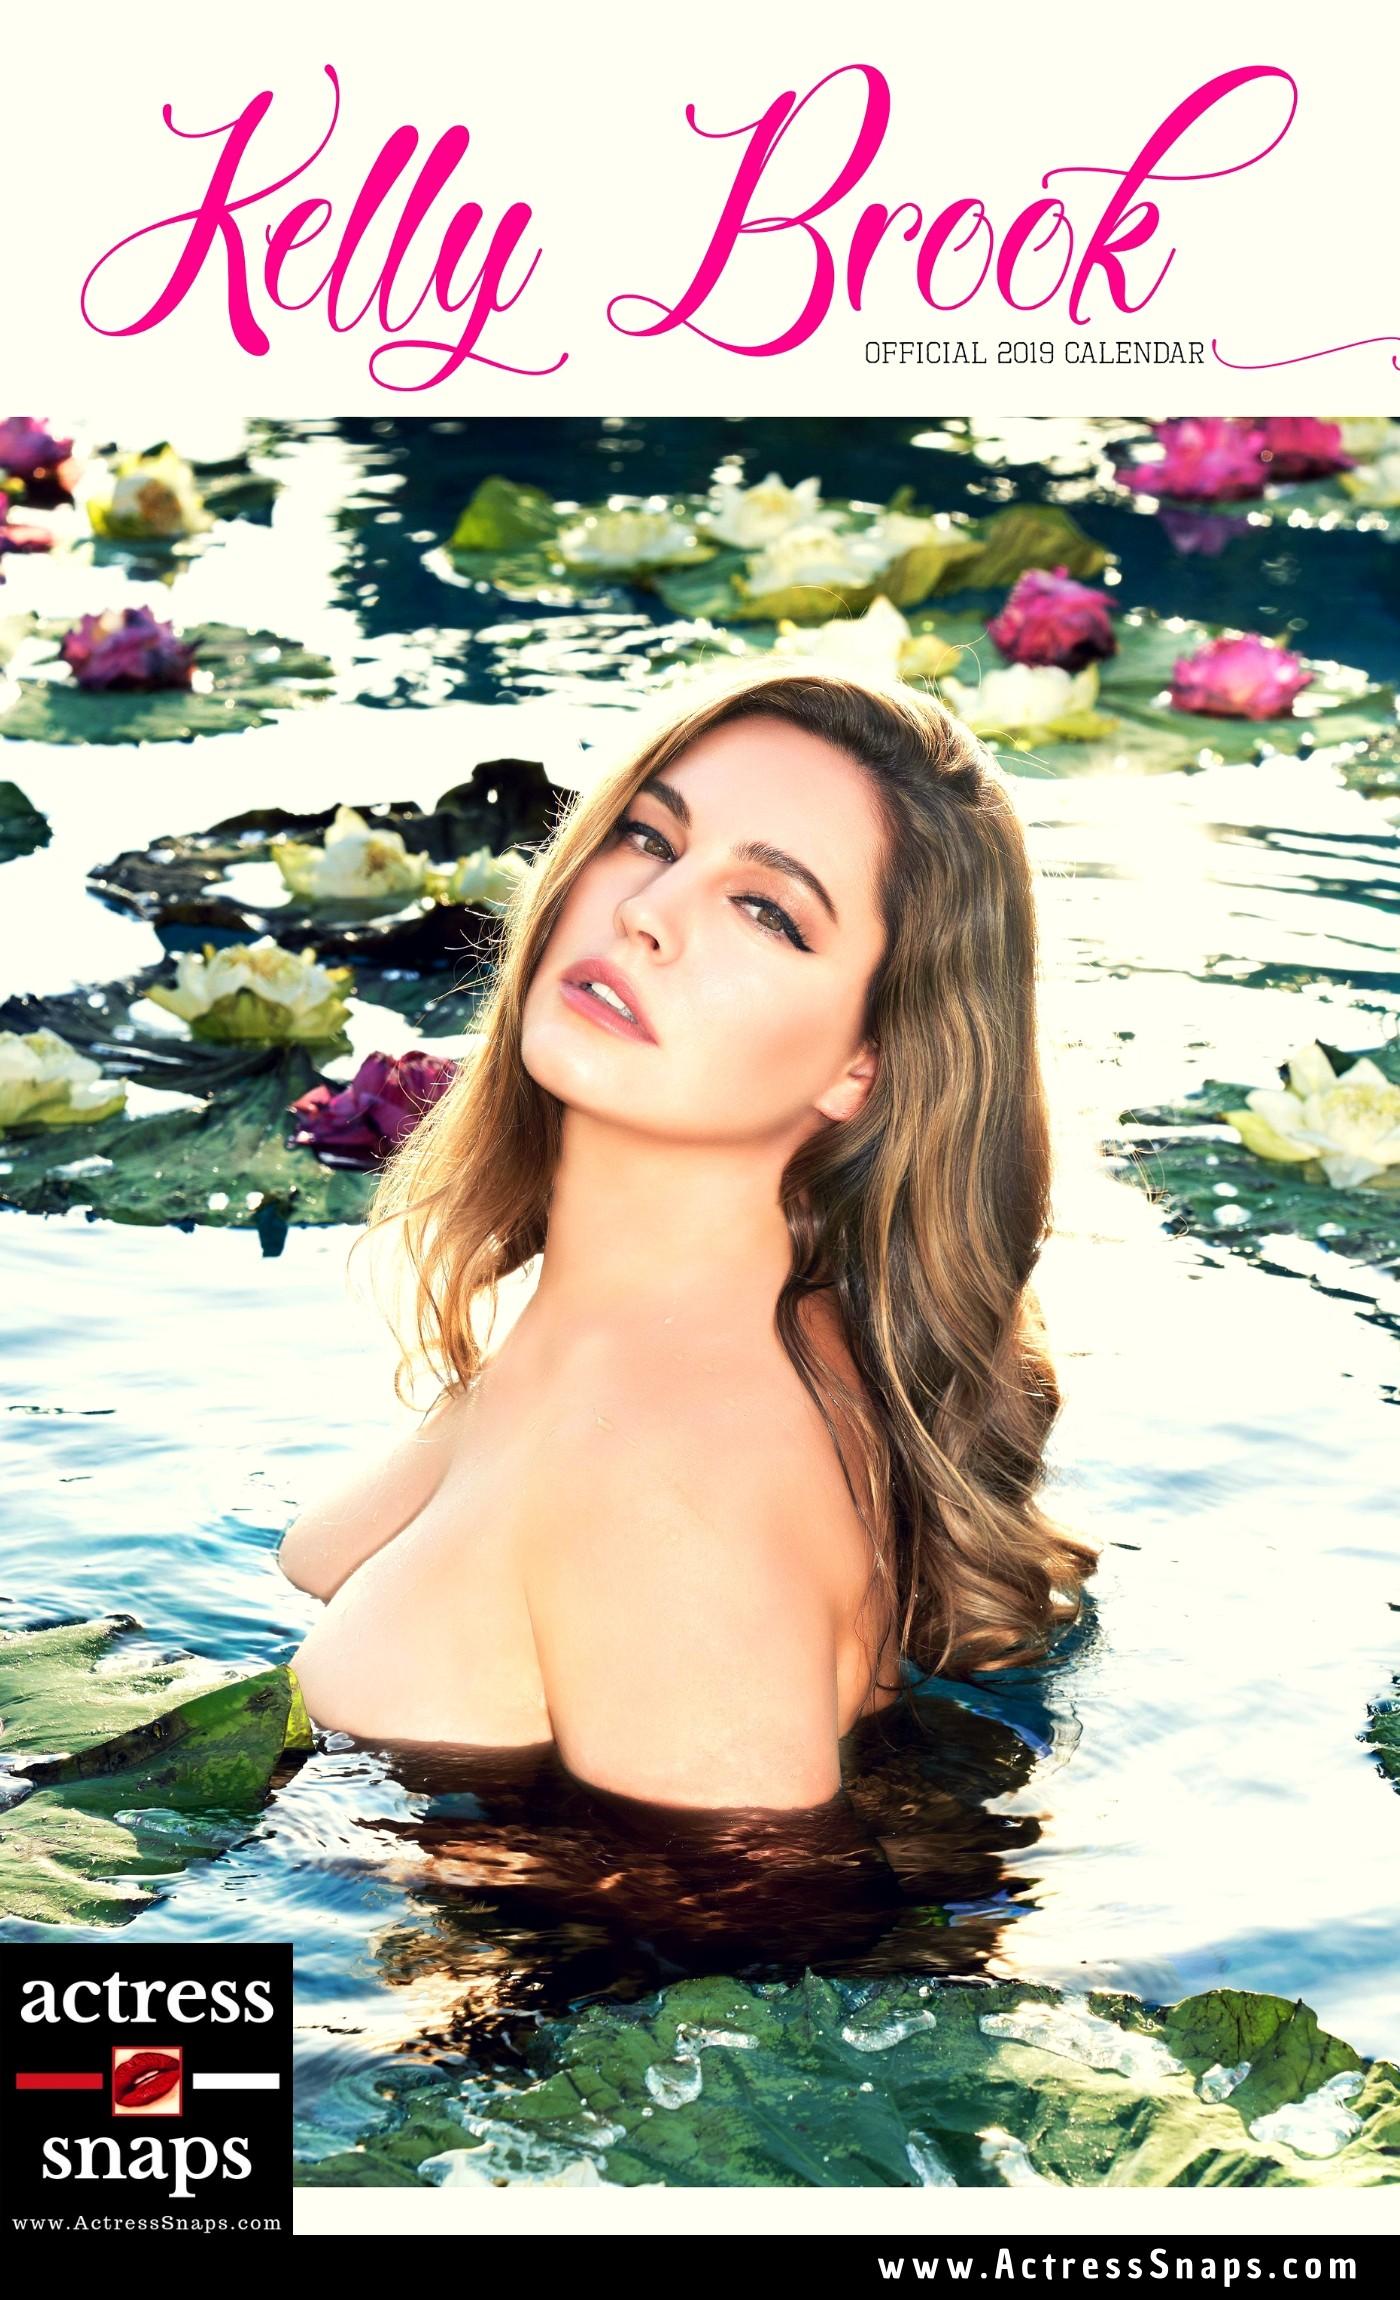 Kelly Brook - 2019 Calendar Photo Shoot - Sexy Actress Pictures | Hot Actress Pictures - ActressSnaps.com